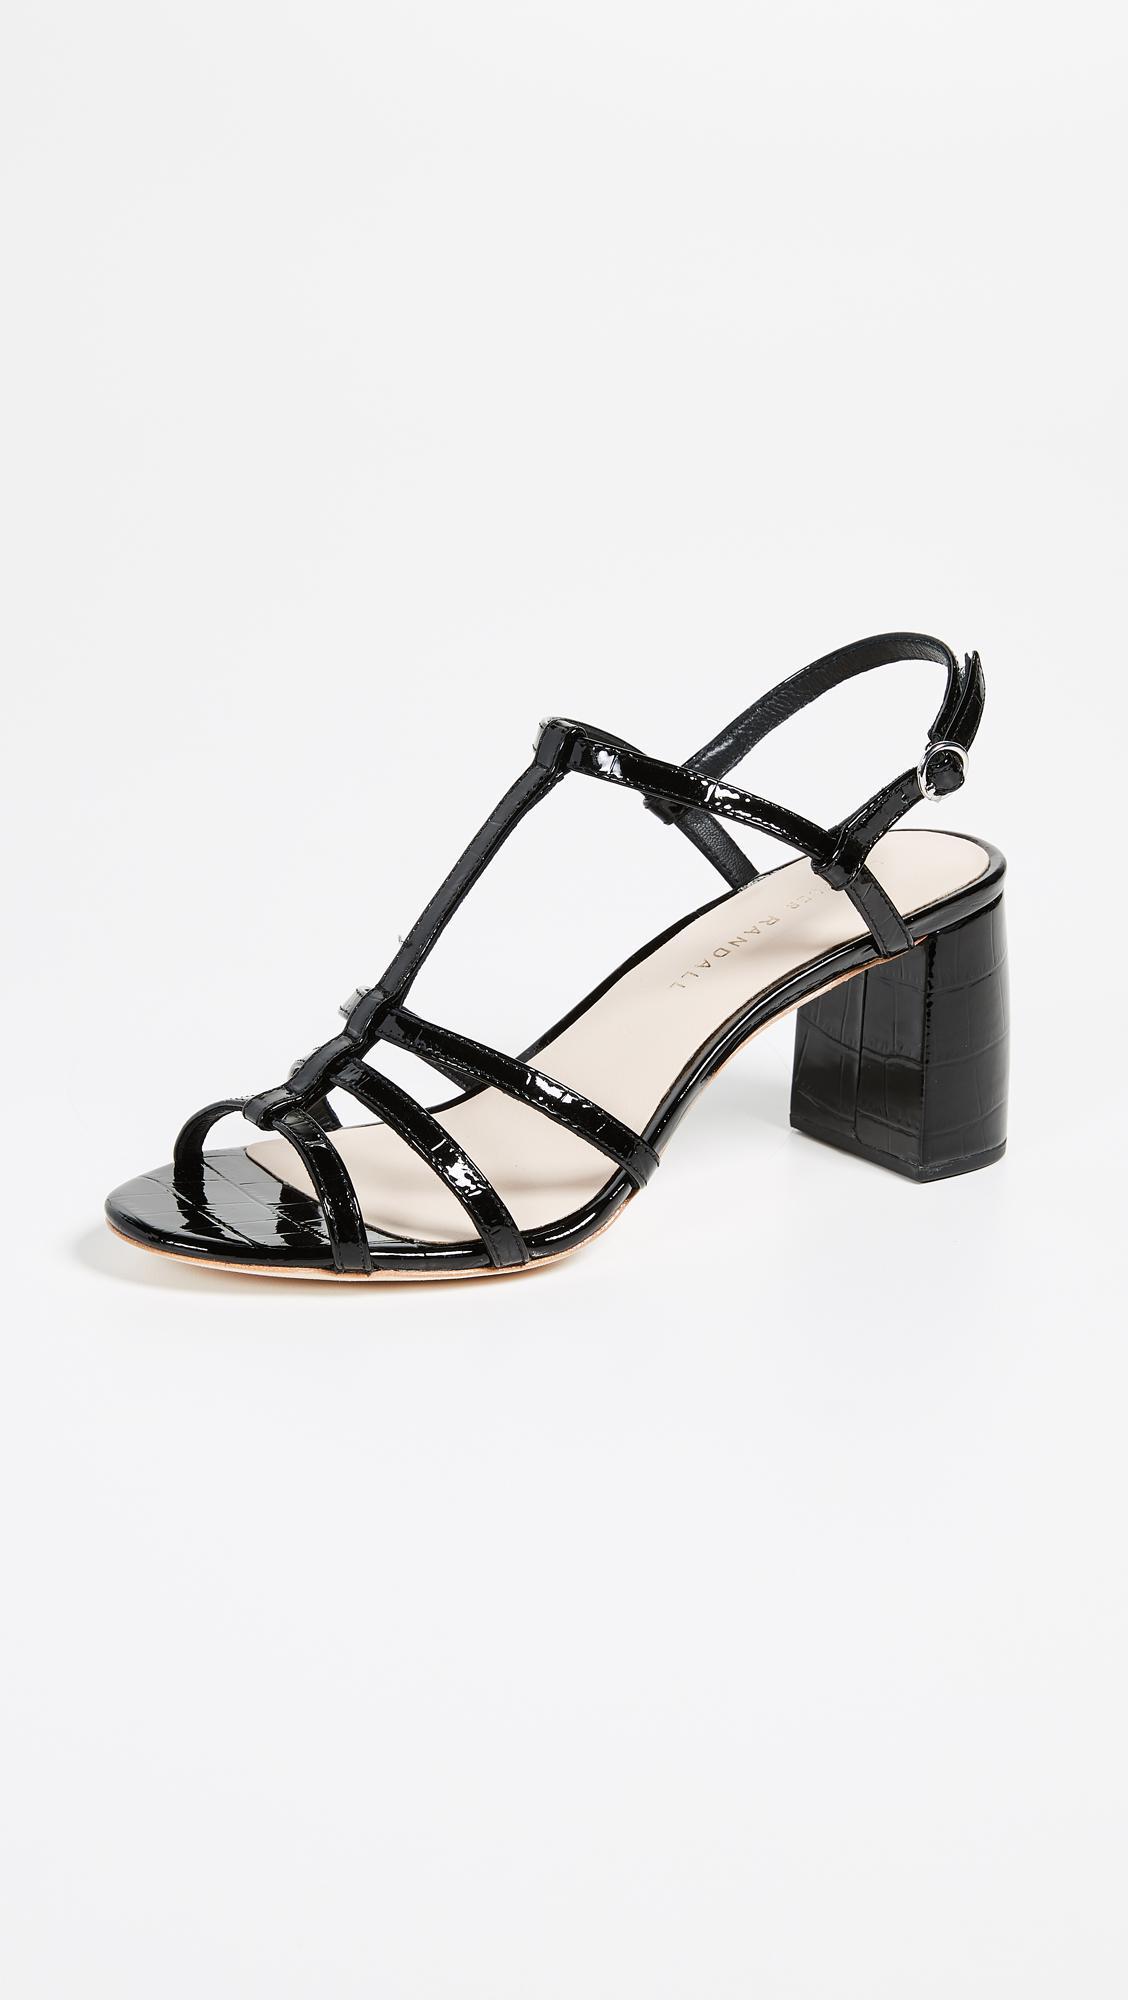 Loeffler Randall Elena Strappy Leather Slingback Sandals kxKUm